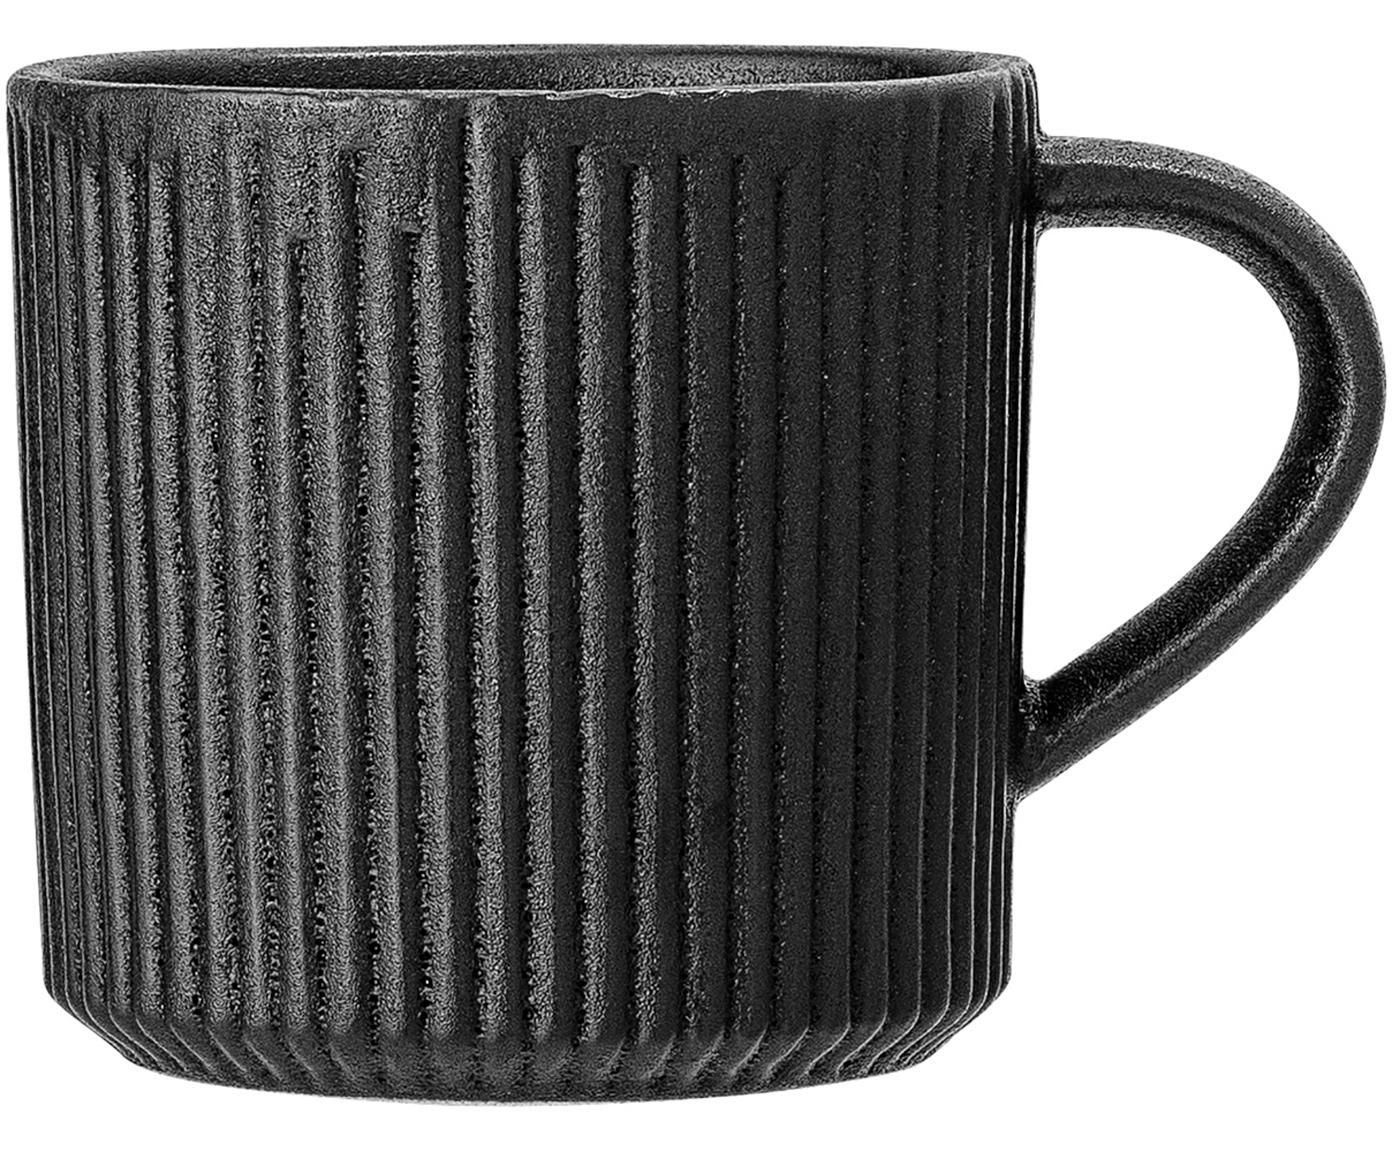 Mokken Neri, 2 stuks, Keramiek, Zwart, Ø 9 x H 9 cm